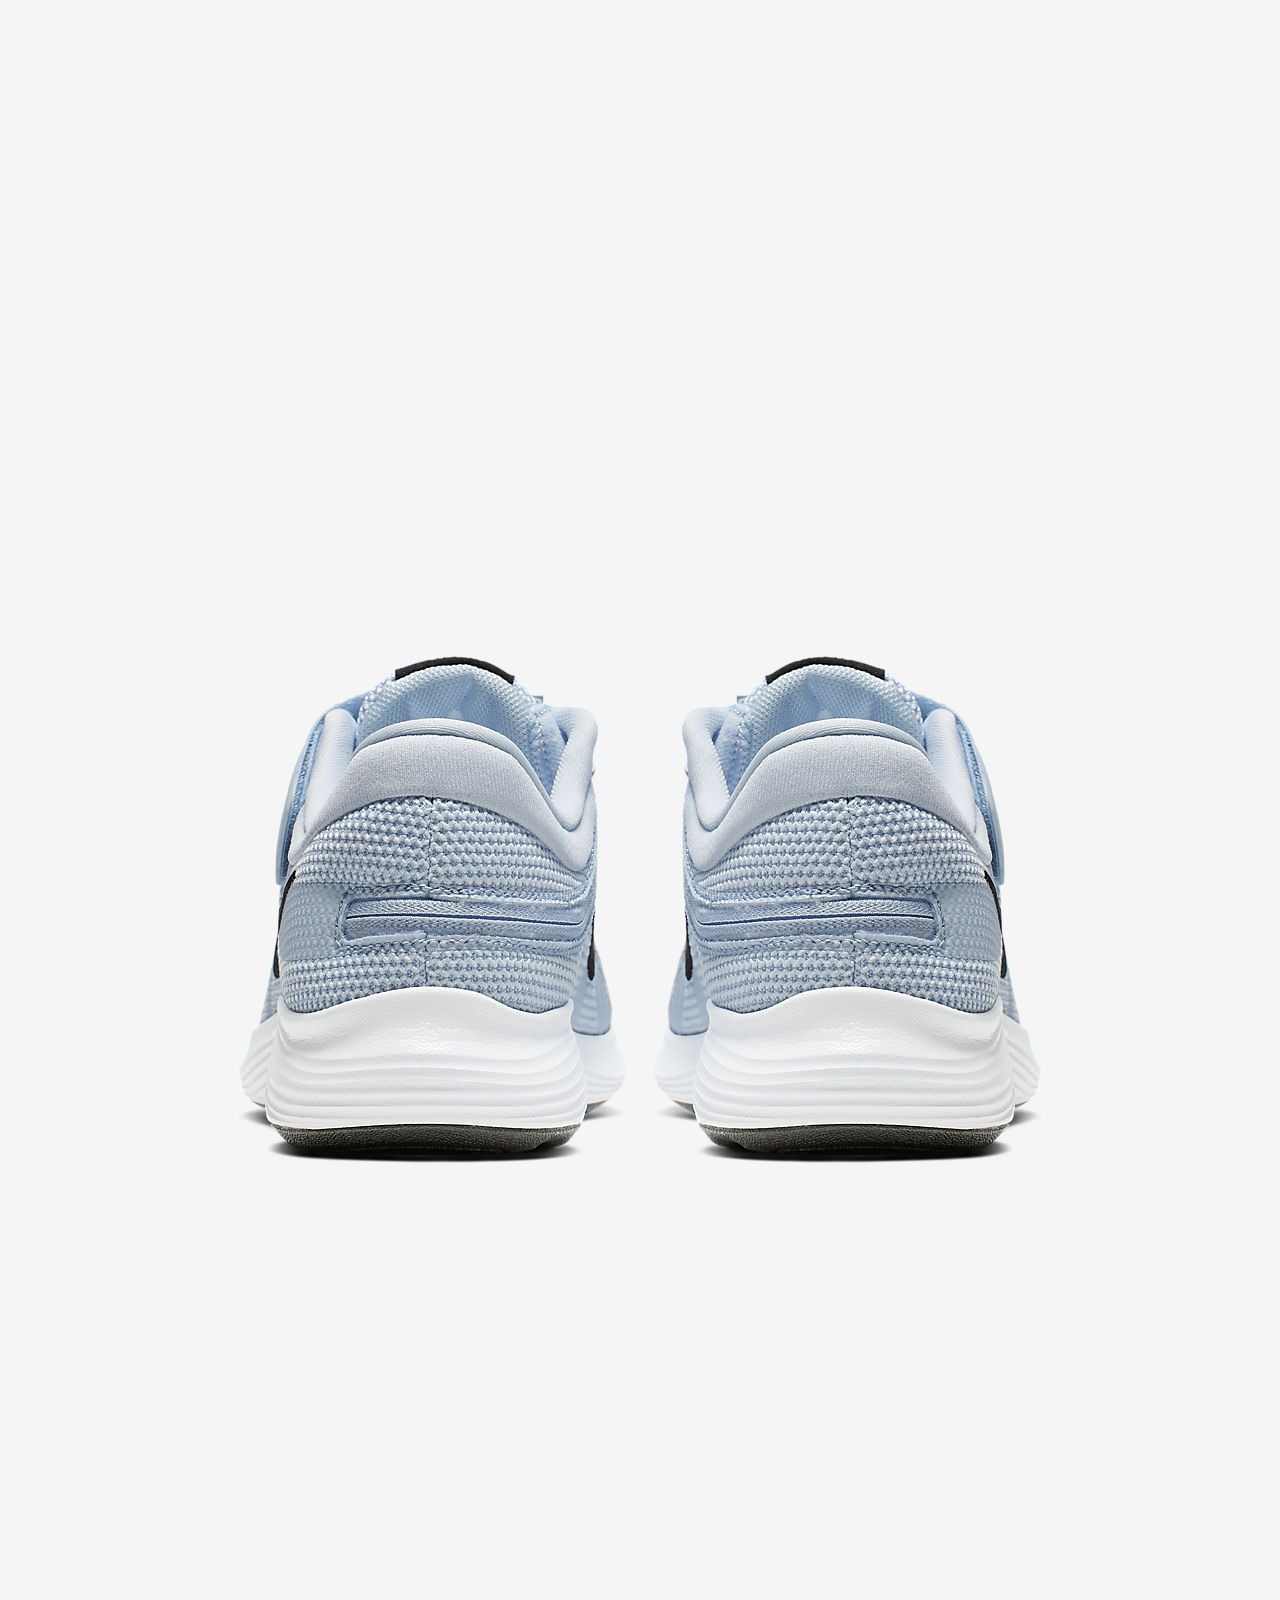 Pour Chaussure Nike Femme De 4 Revolution Running Flyease